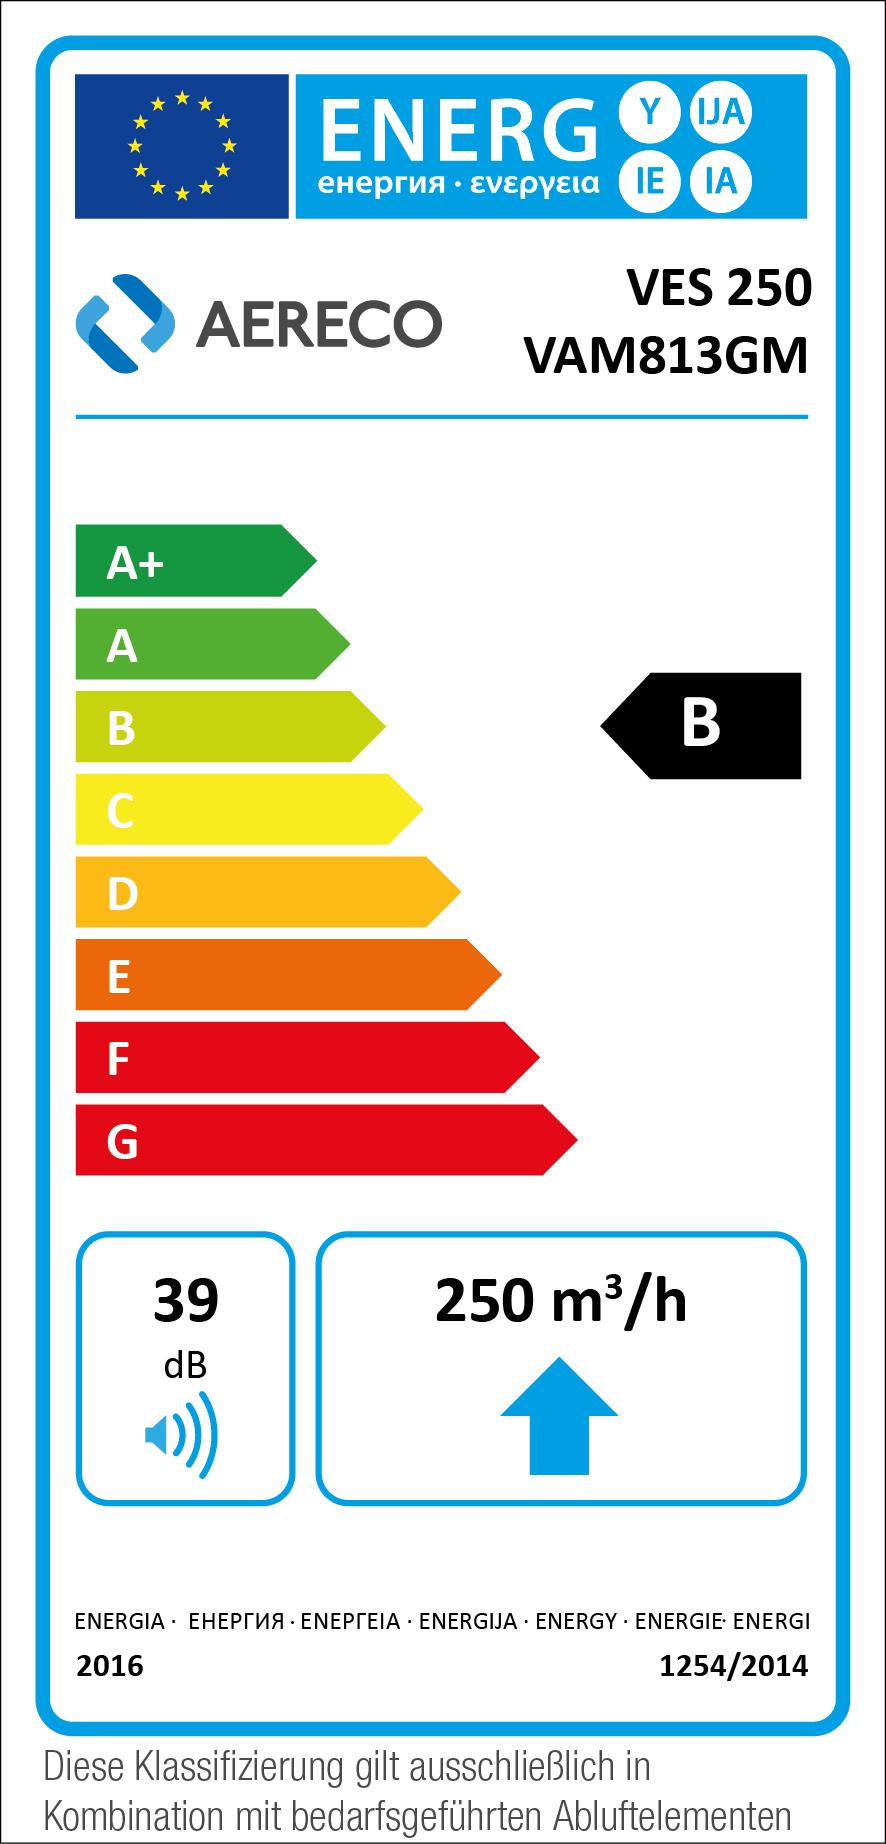 Energielabel VES 250 Lüftungsgerät